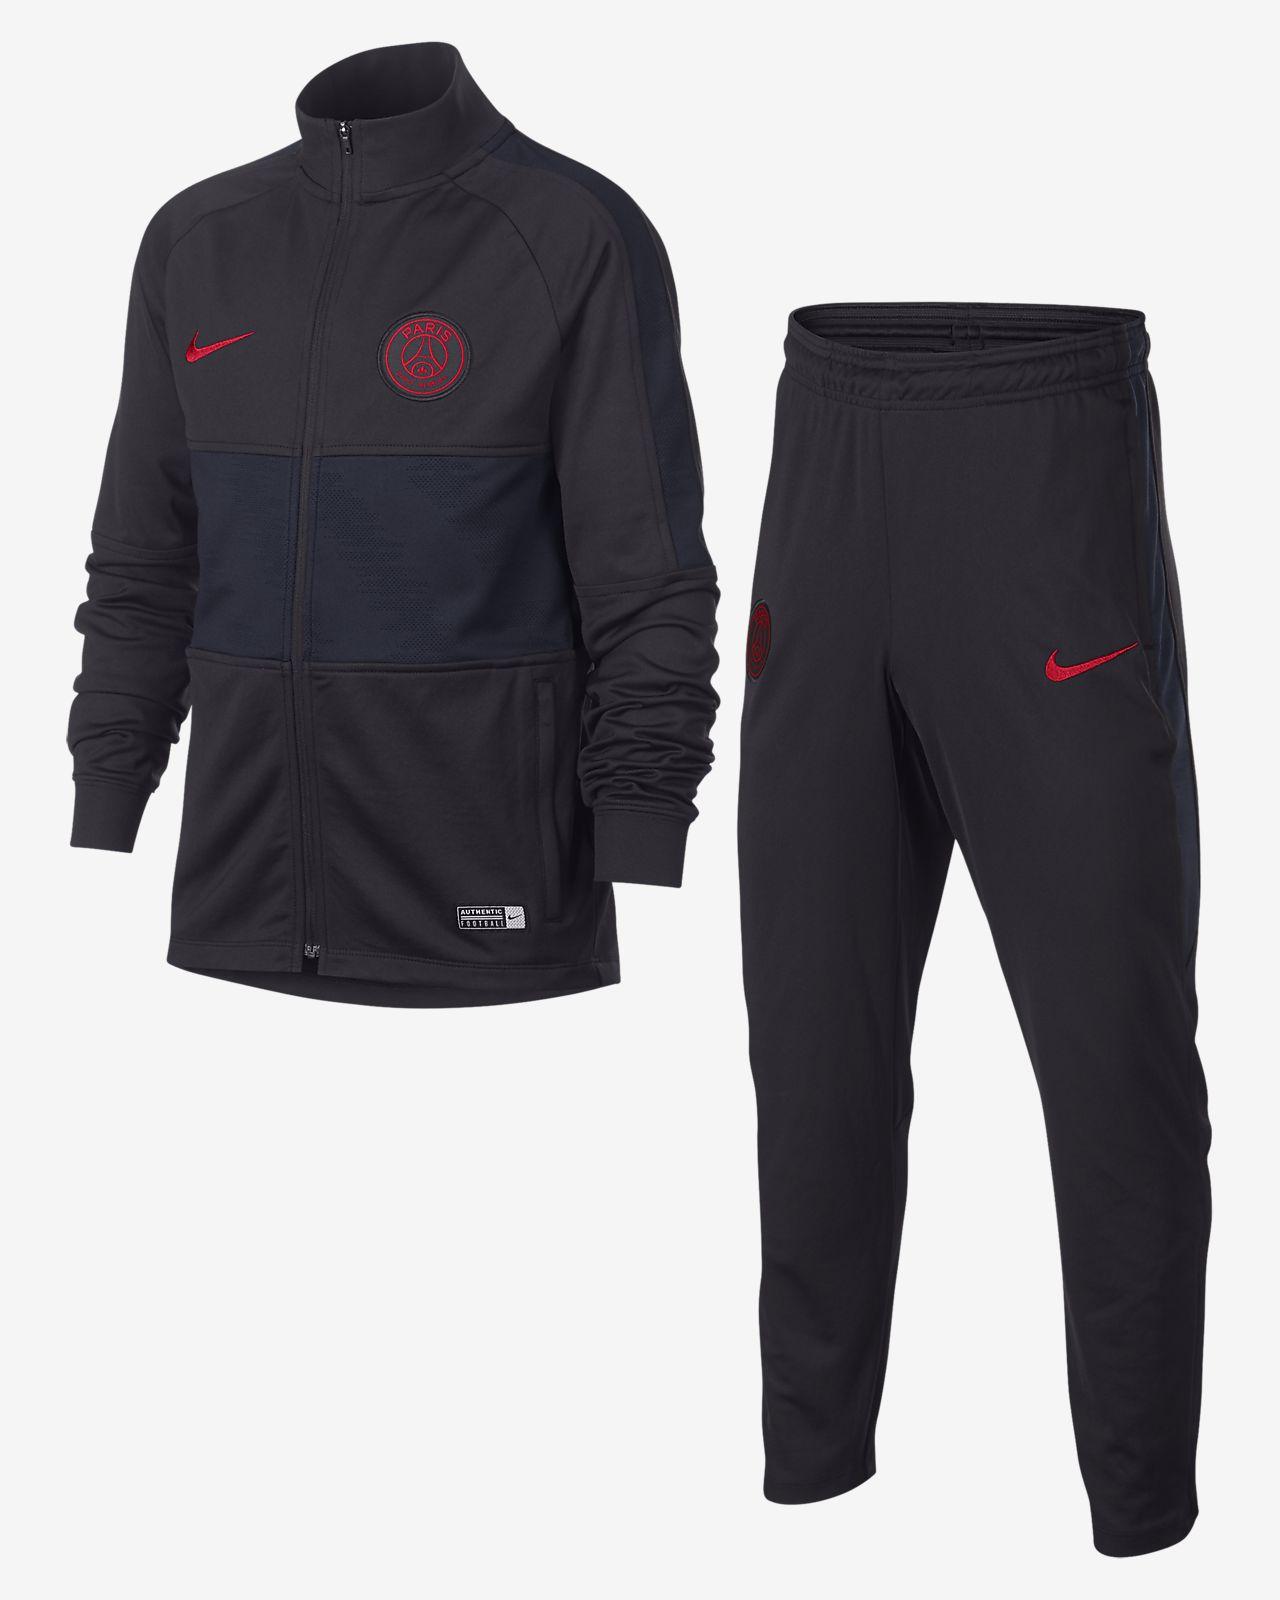 Nike Dri Fit Paris Saint Germain Strike Fussball Trainingsanzug Fur Altere Kinder